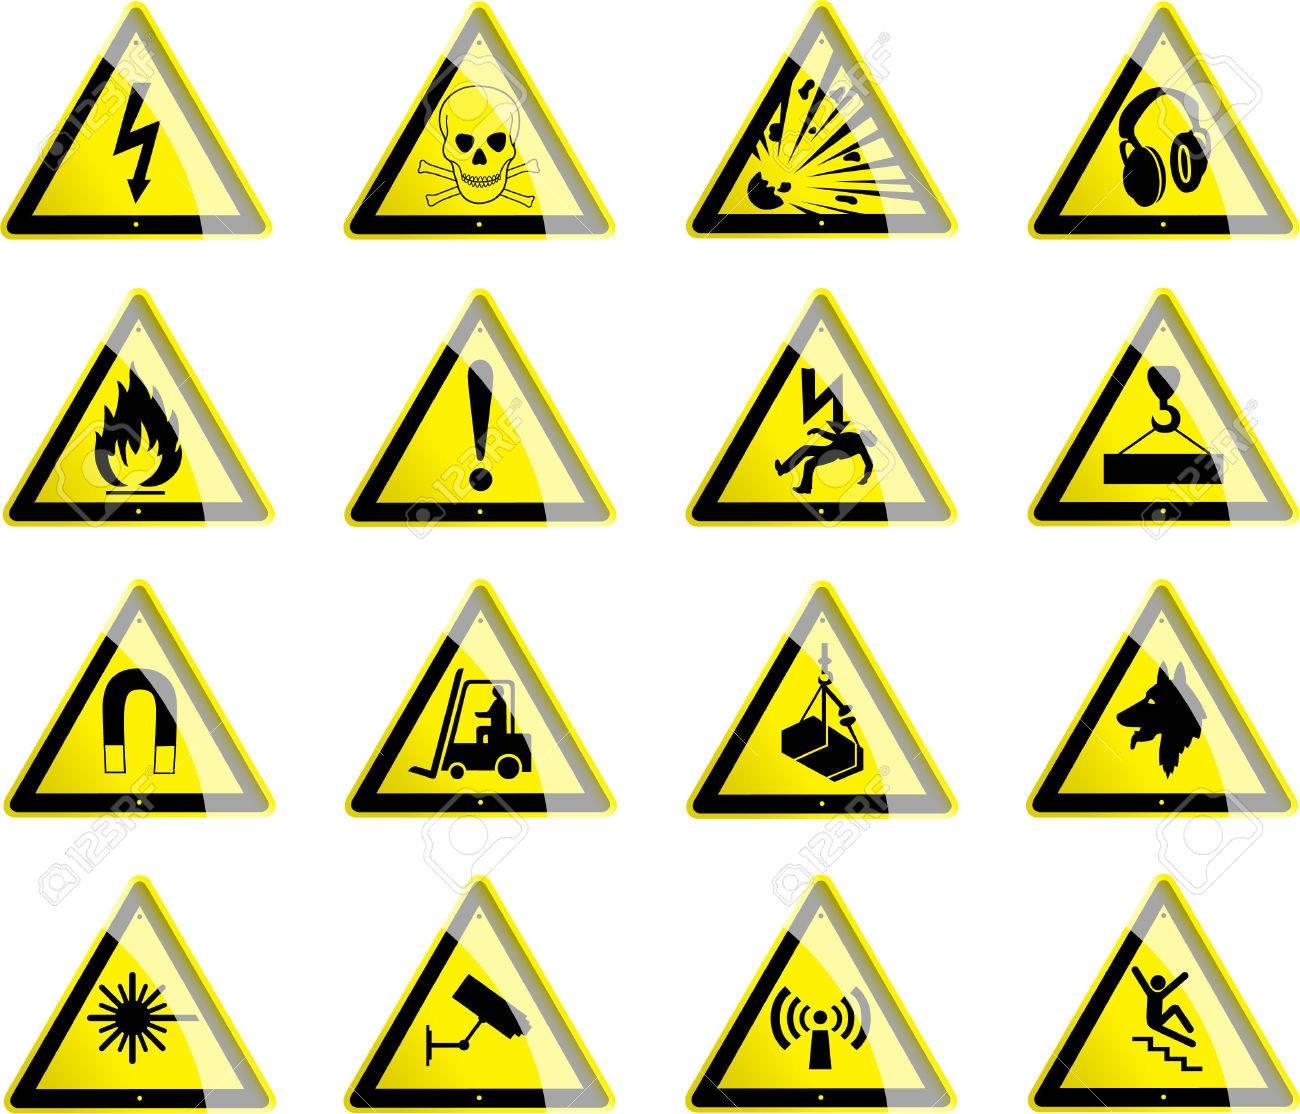 Triangular hazard symbols royalty free cliparts vectors and triangular hazard symbols stock vector 48795596 biocorpaavc Gallery